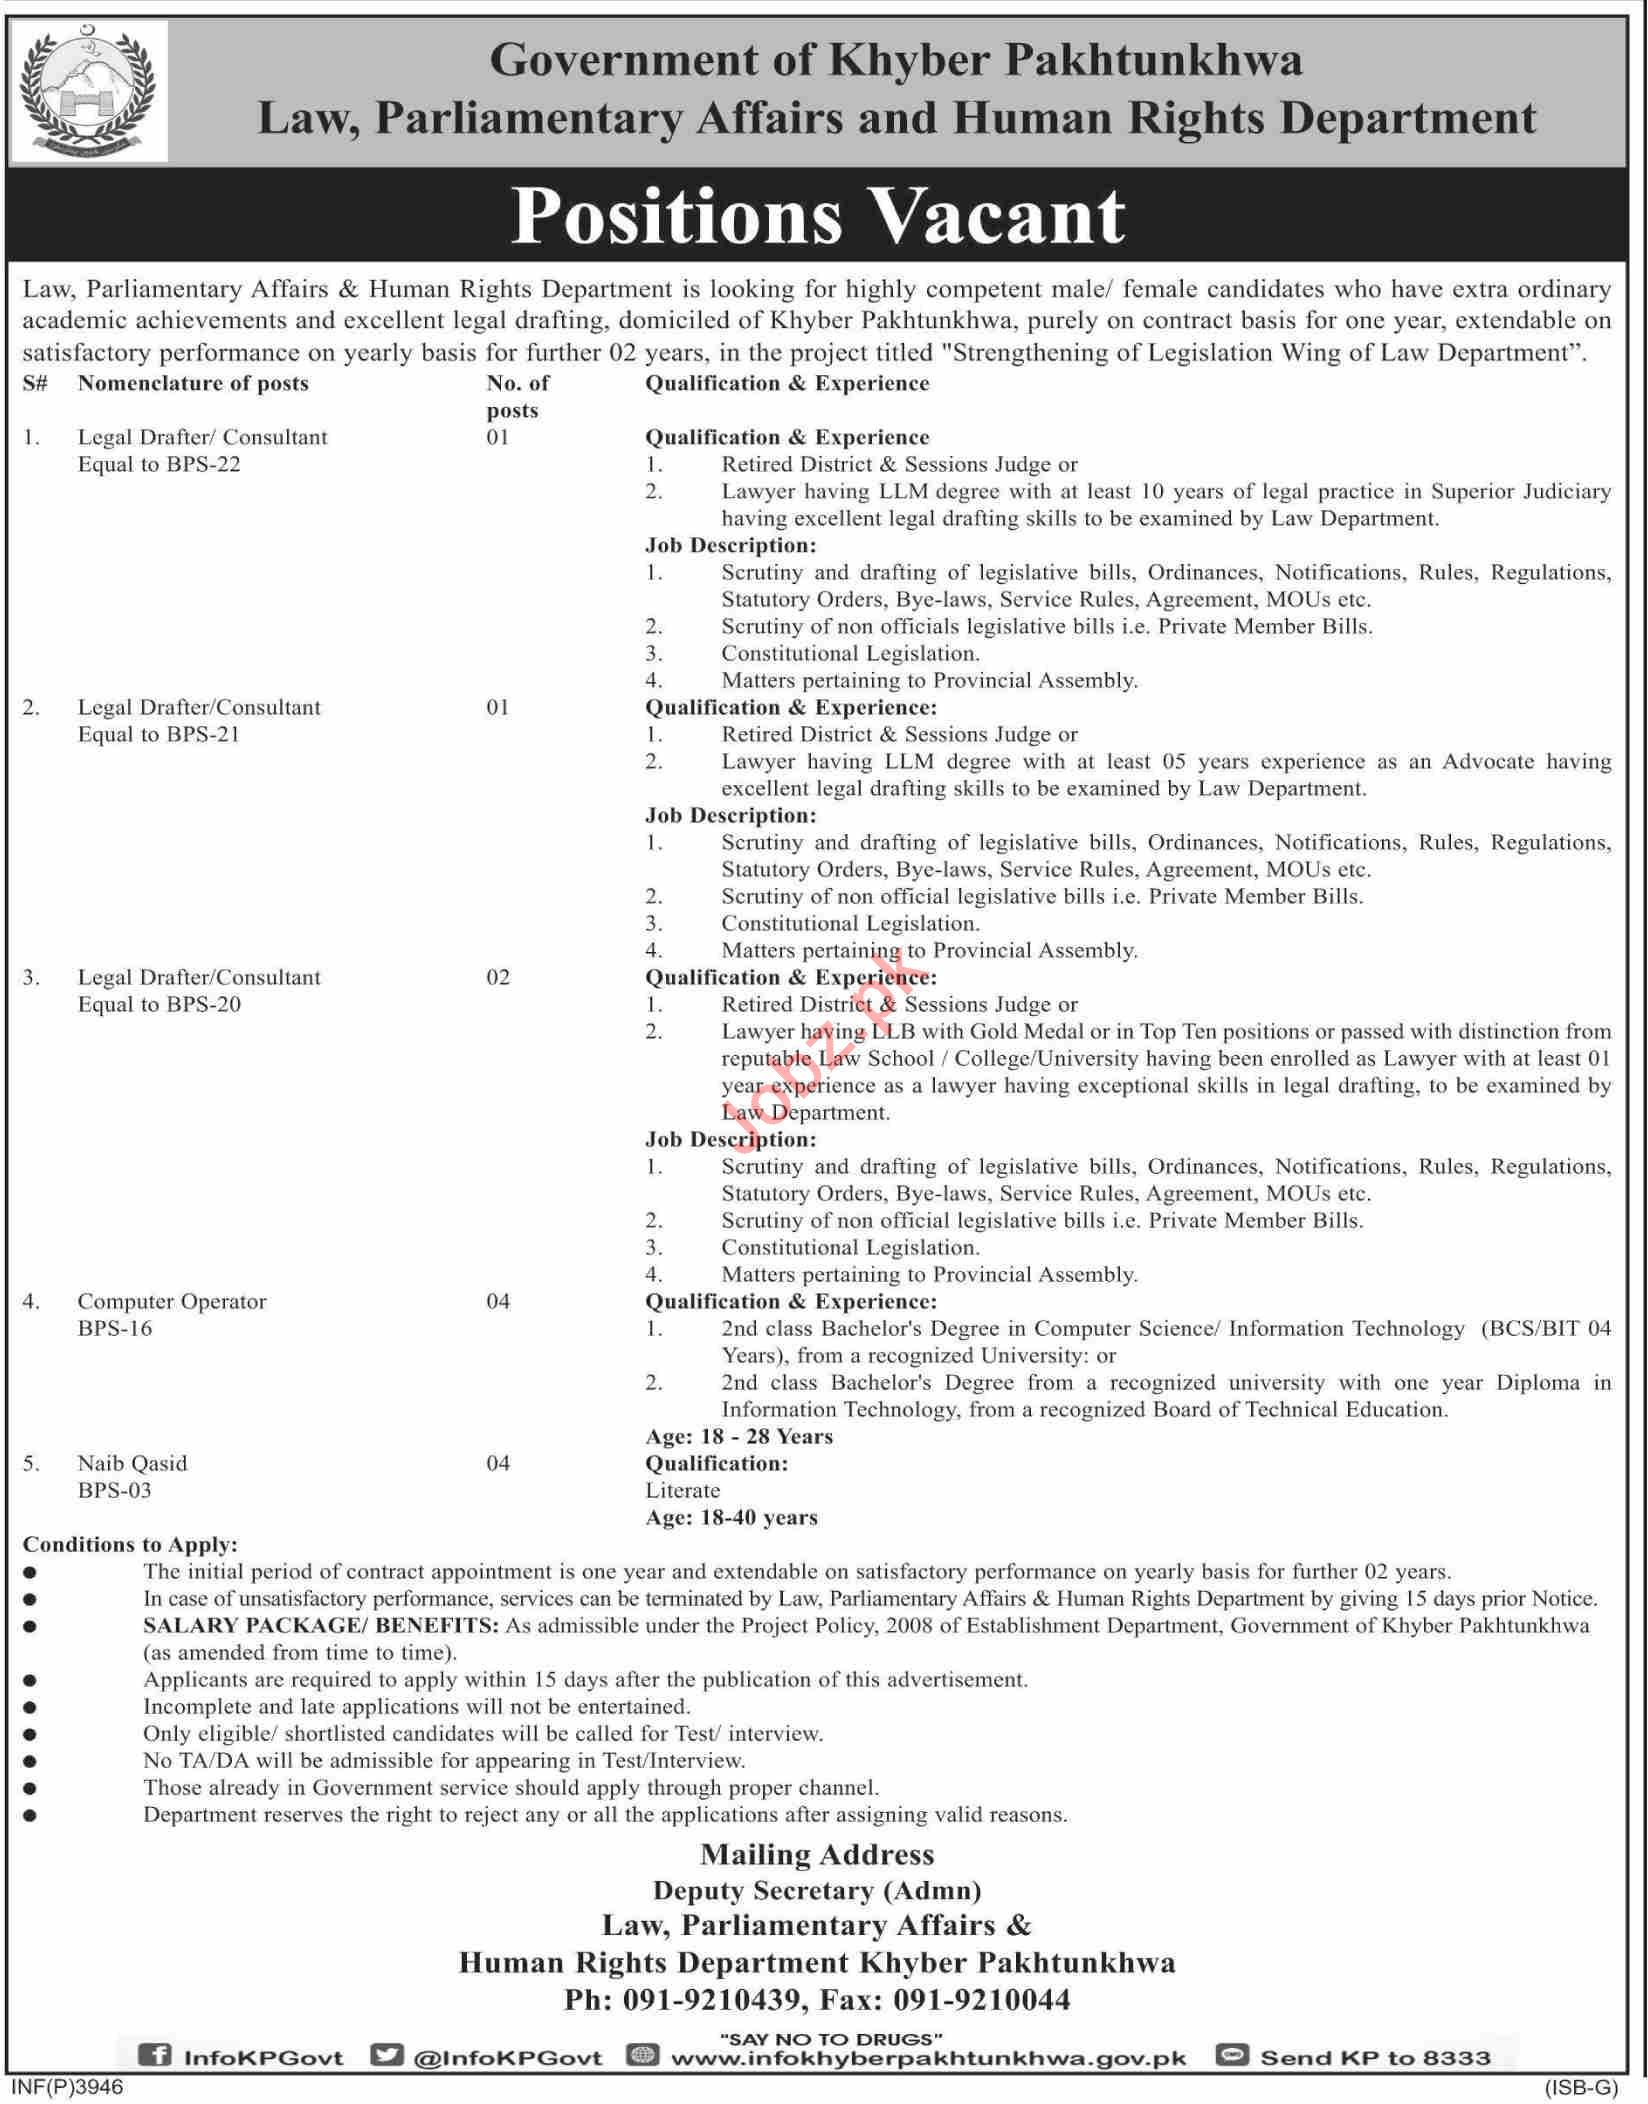 Law Parliamentary Affairs & Human Rights Department KPK Jobs